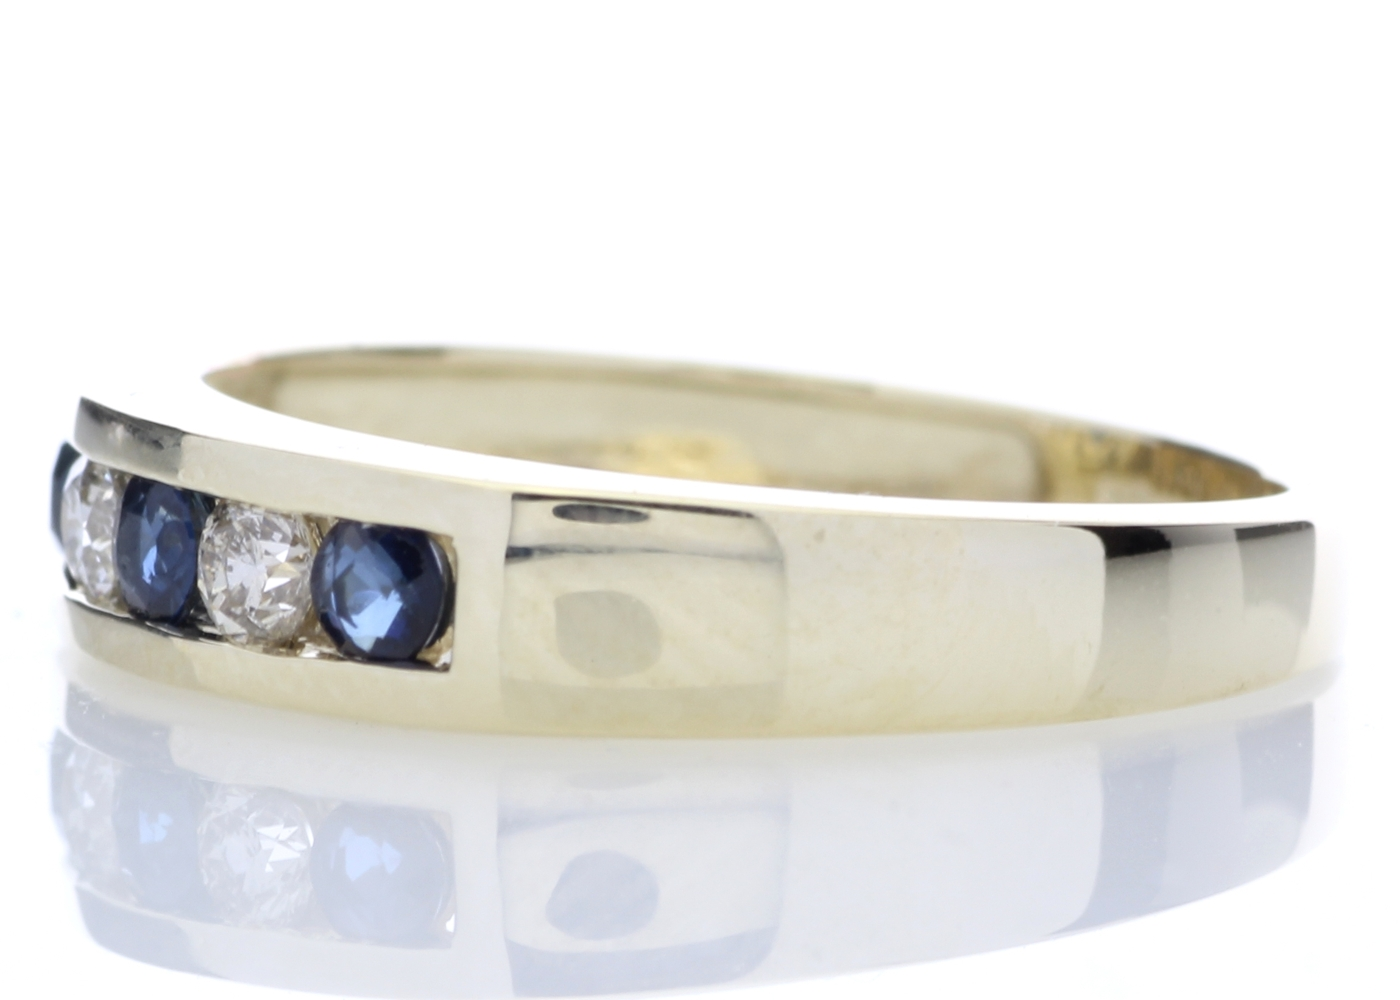 9ct Yellow Gold Channel Set Semi-Eternity Diamond Ring 0.25 Carats - Image 3 of 5